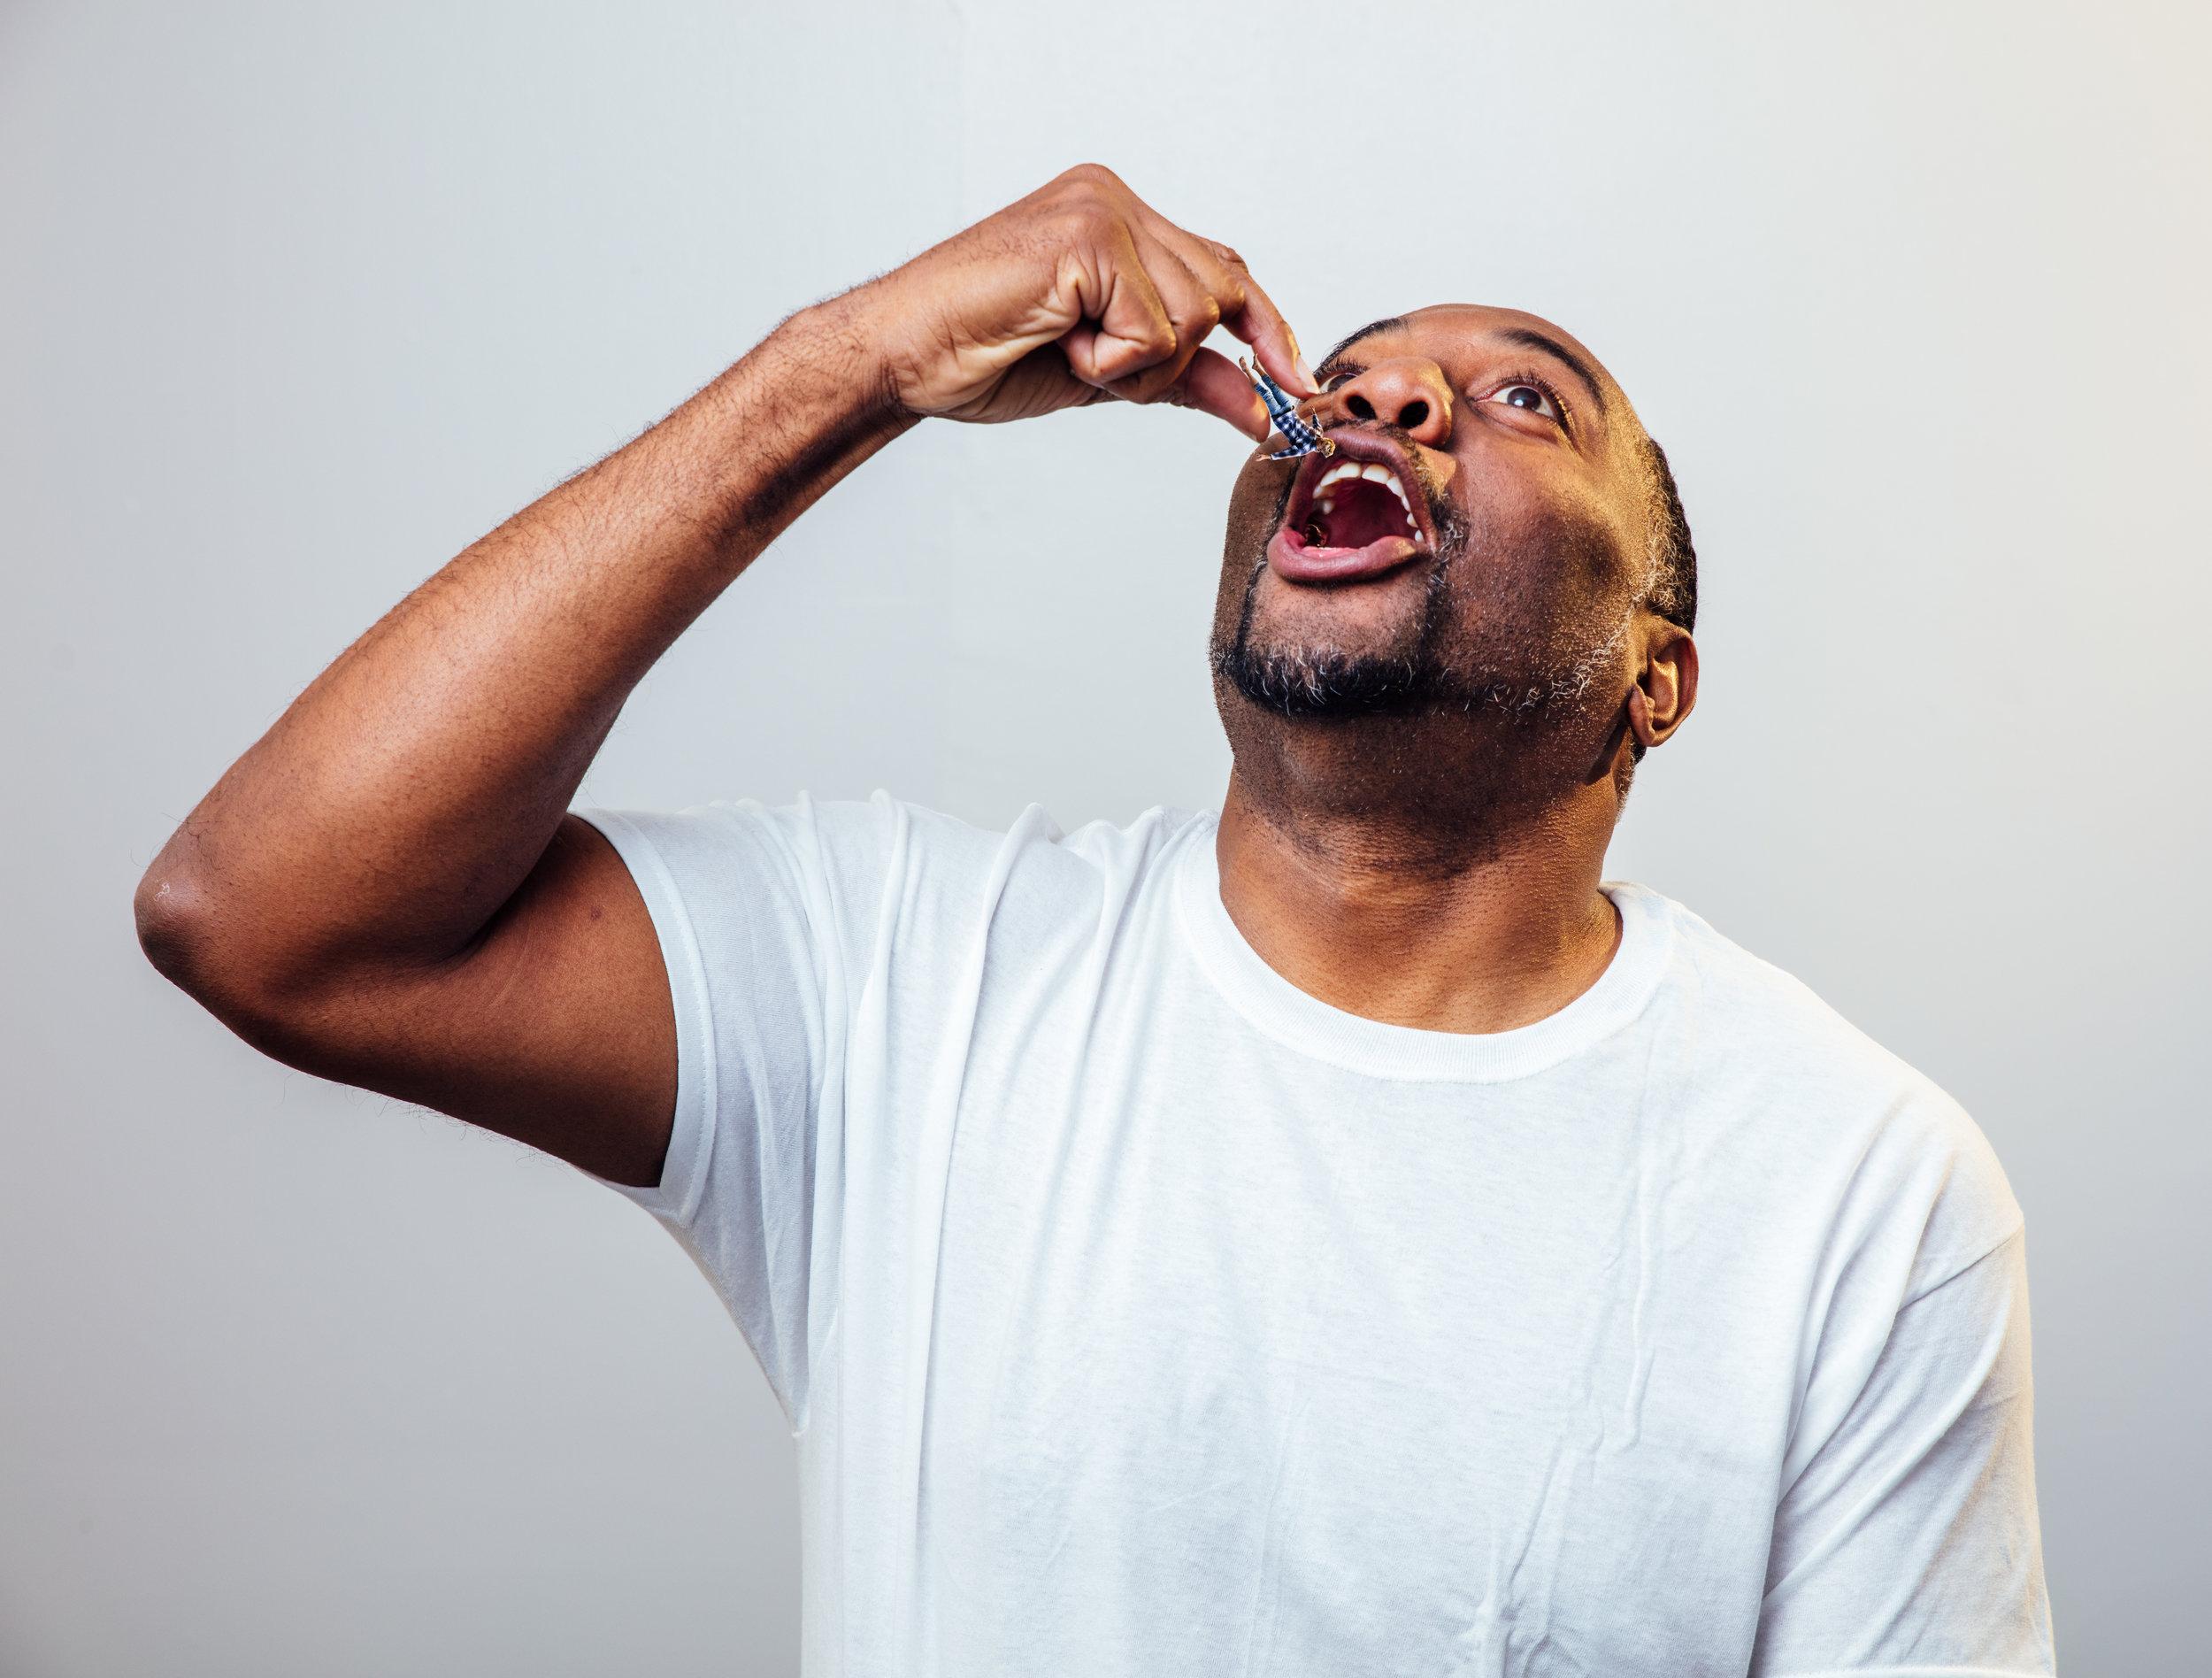 Dorian Lockett in Honey, I Shrunk The Whites. Photo by James Jordan Pictures.